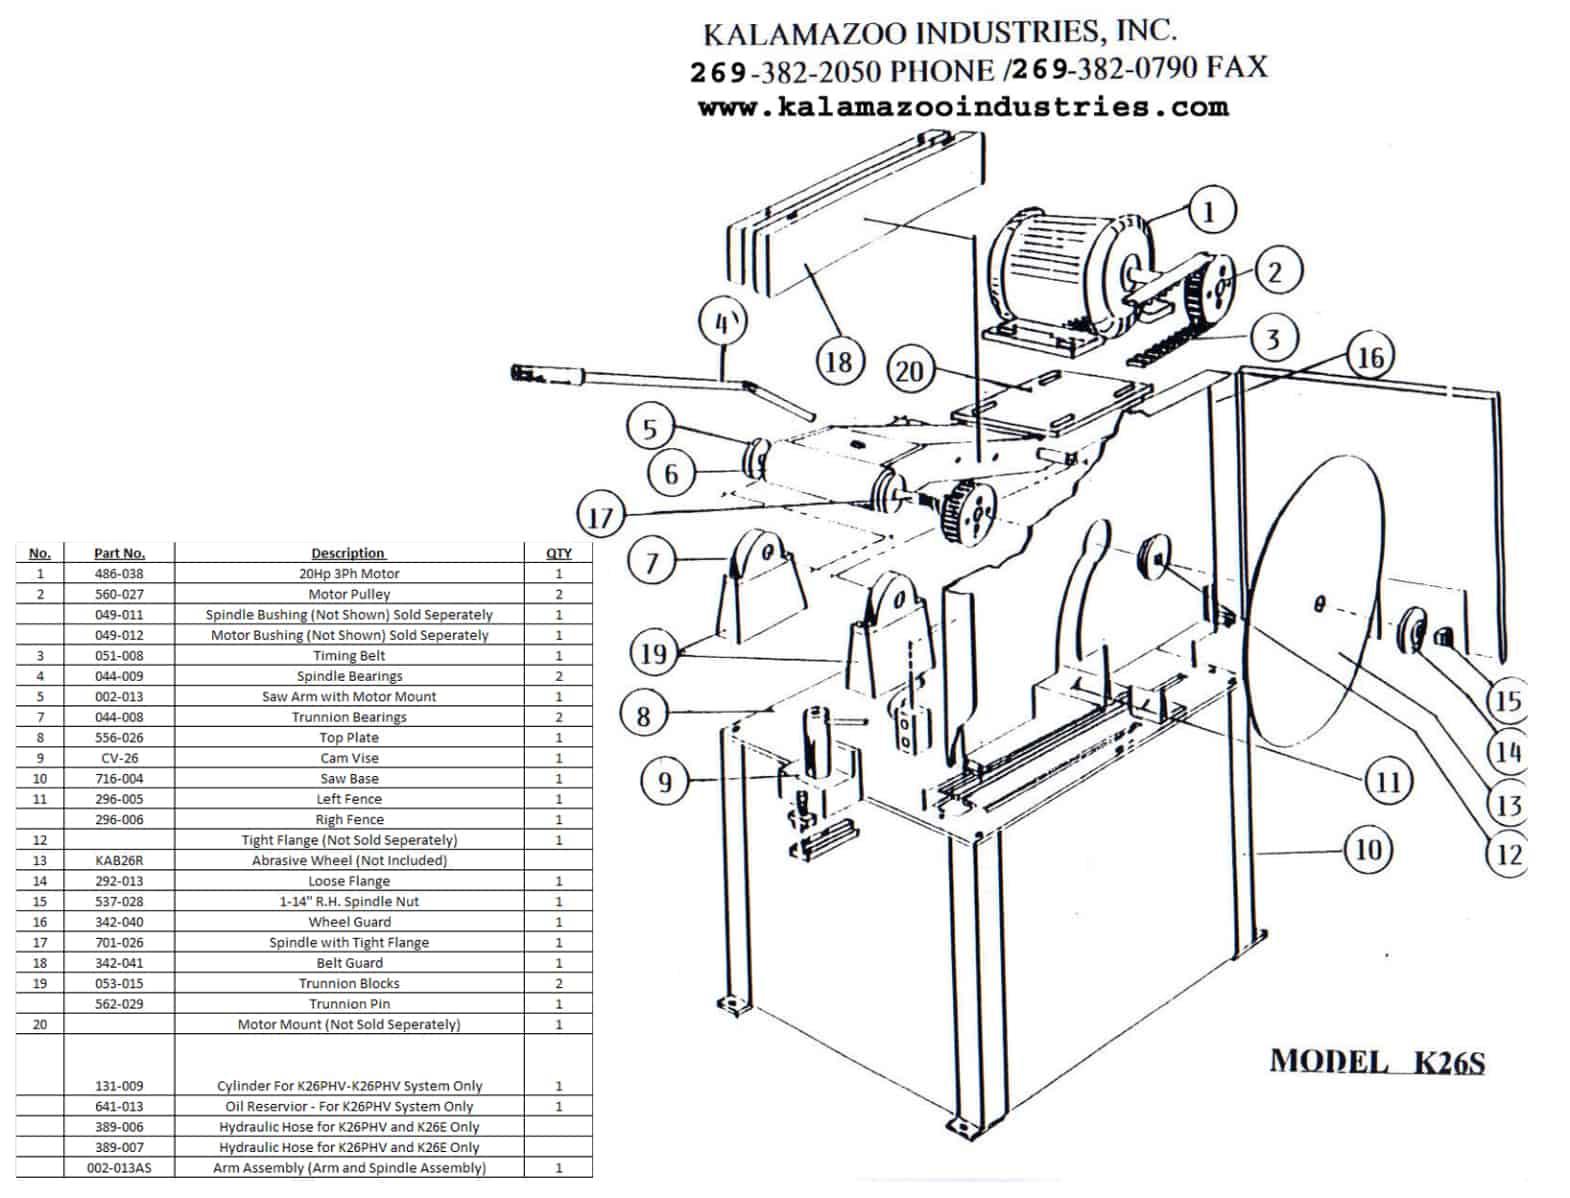 K26S 26 inch heavy duty abrasive chop saw